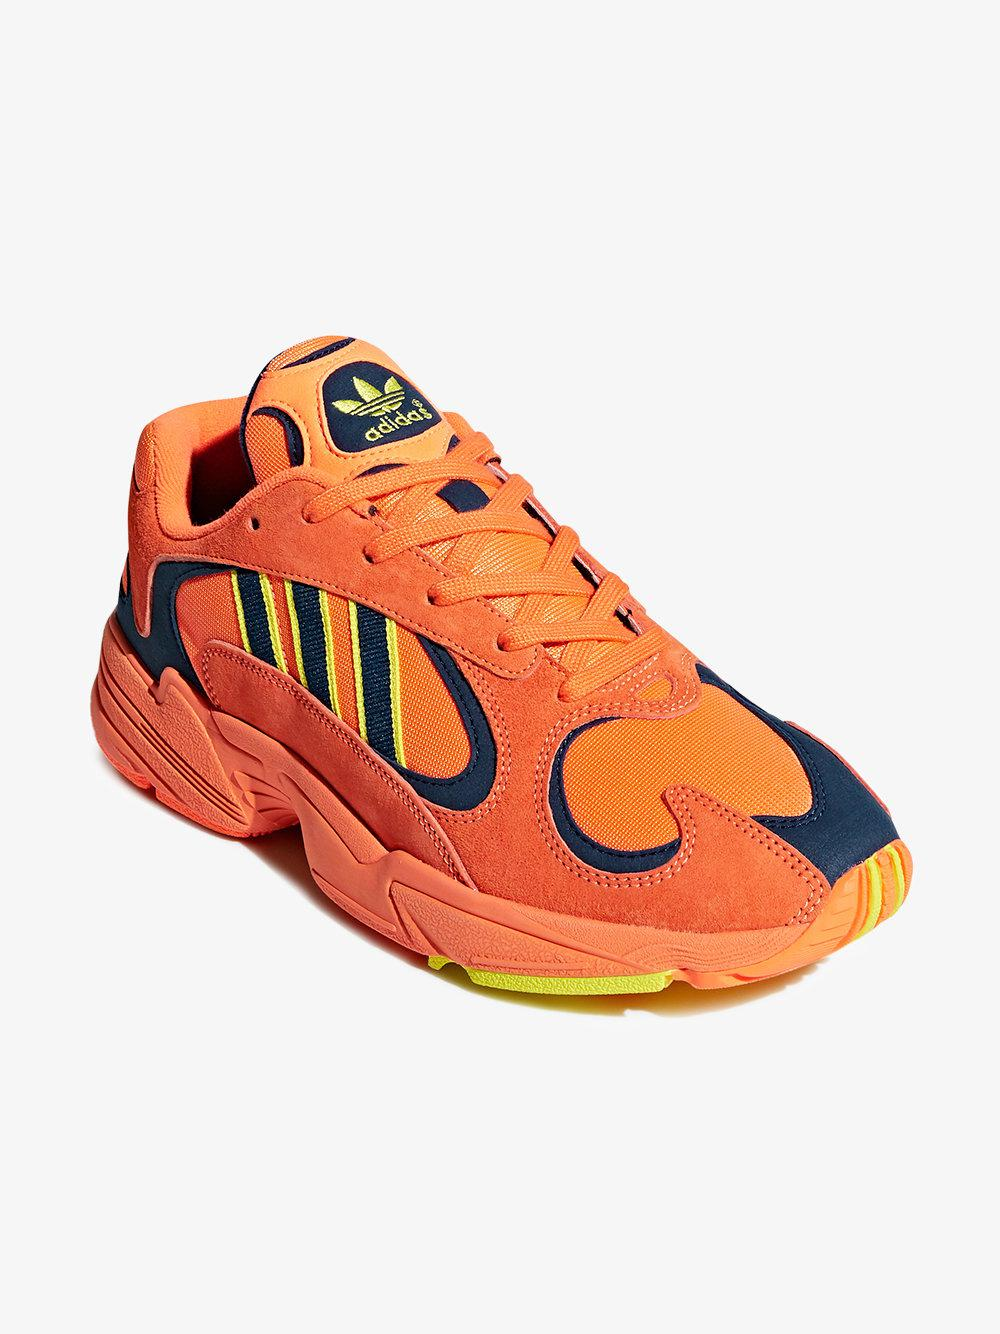 1a3d982e05e Lyst - adidas Originals Yung 1 Trainers Orange in Orange for Men ...